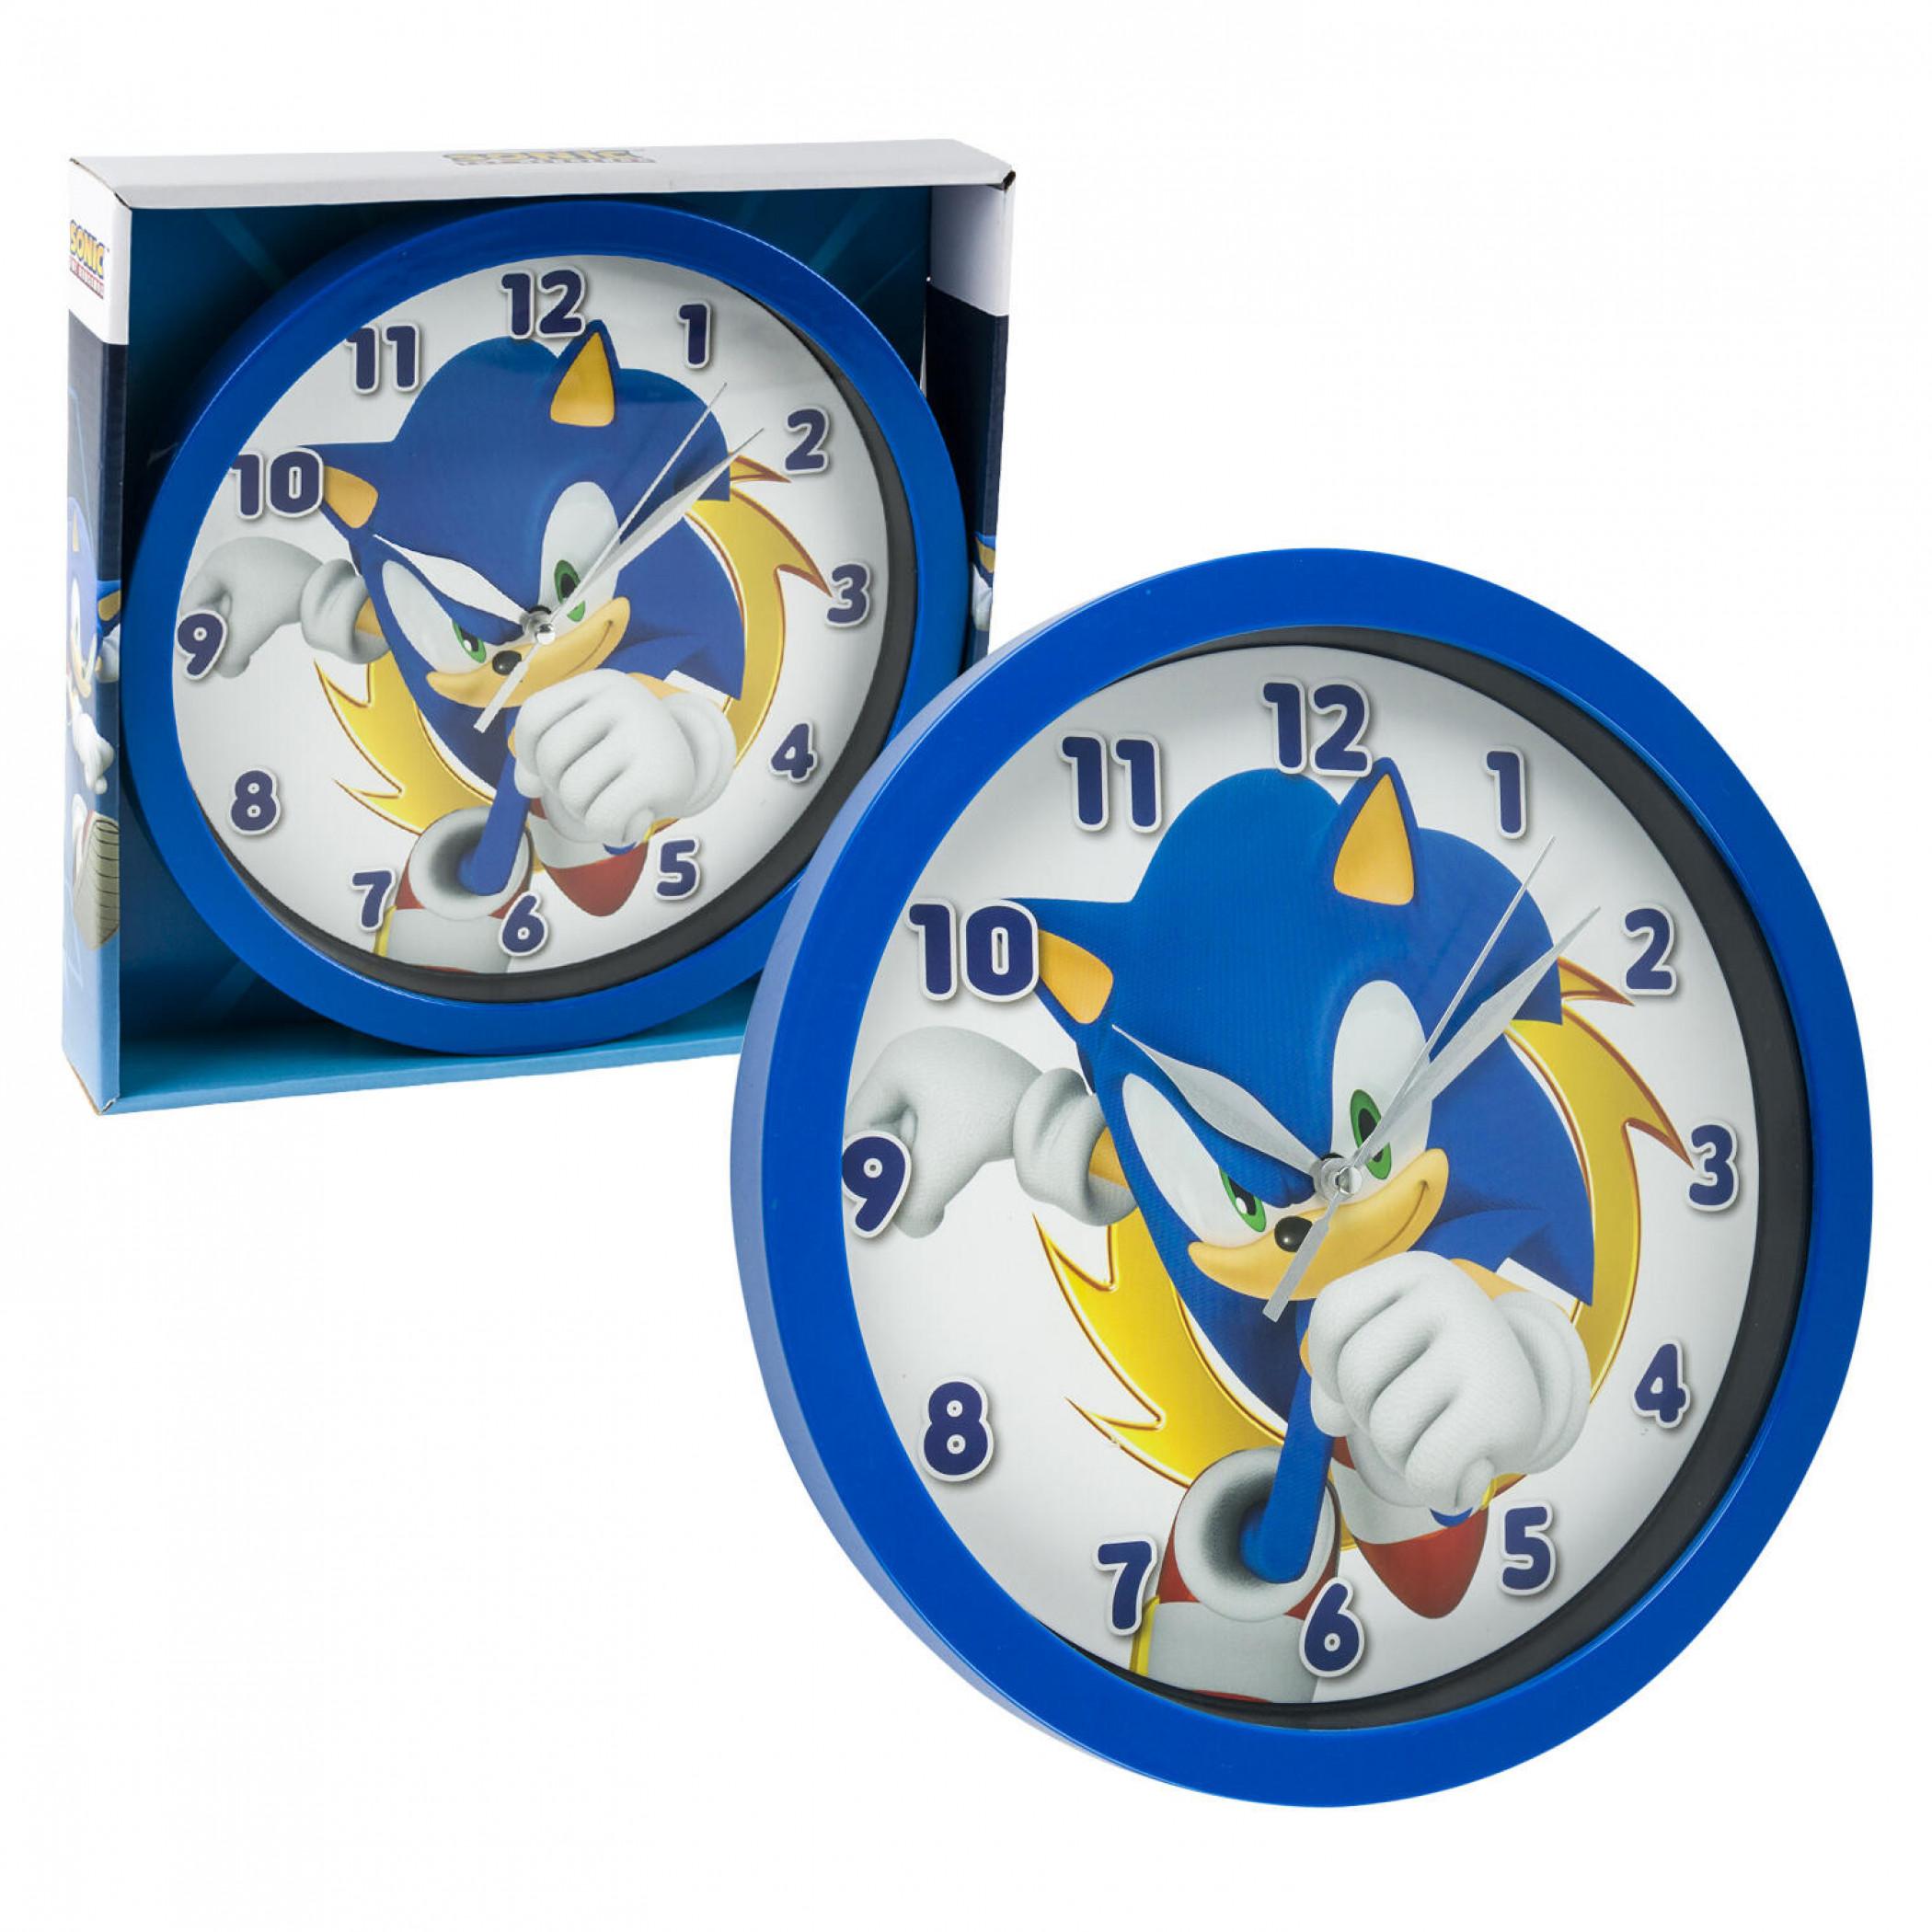 "Sonic the Hedgehog Character Print 9 3/4"" Wall Clock"